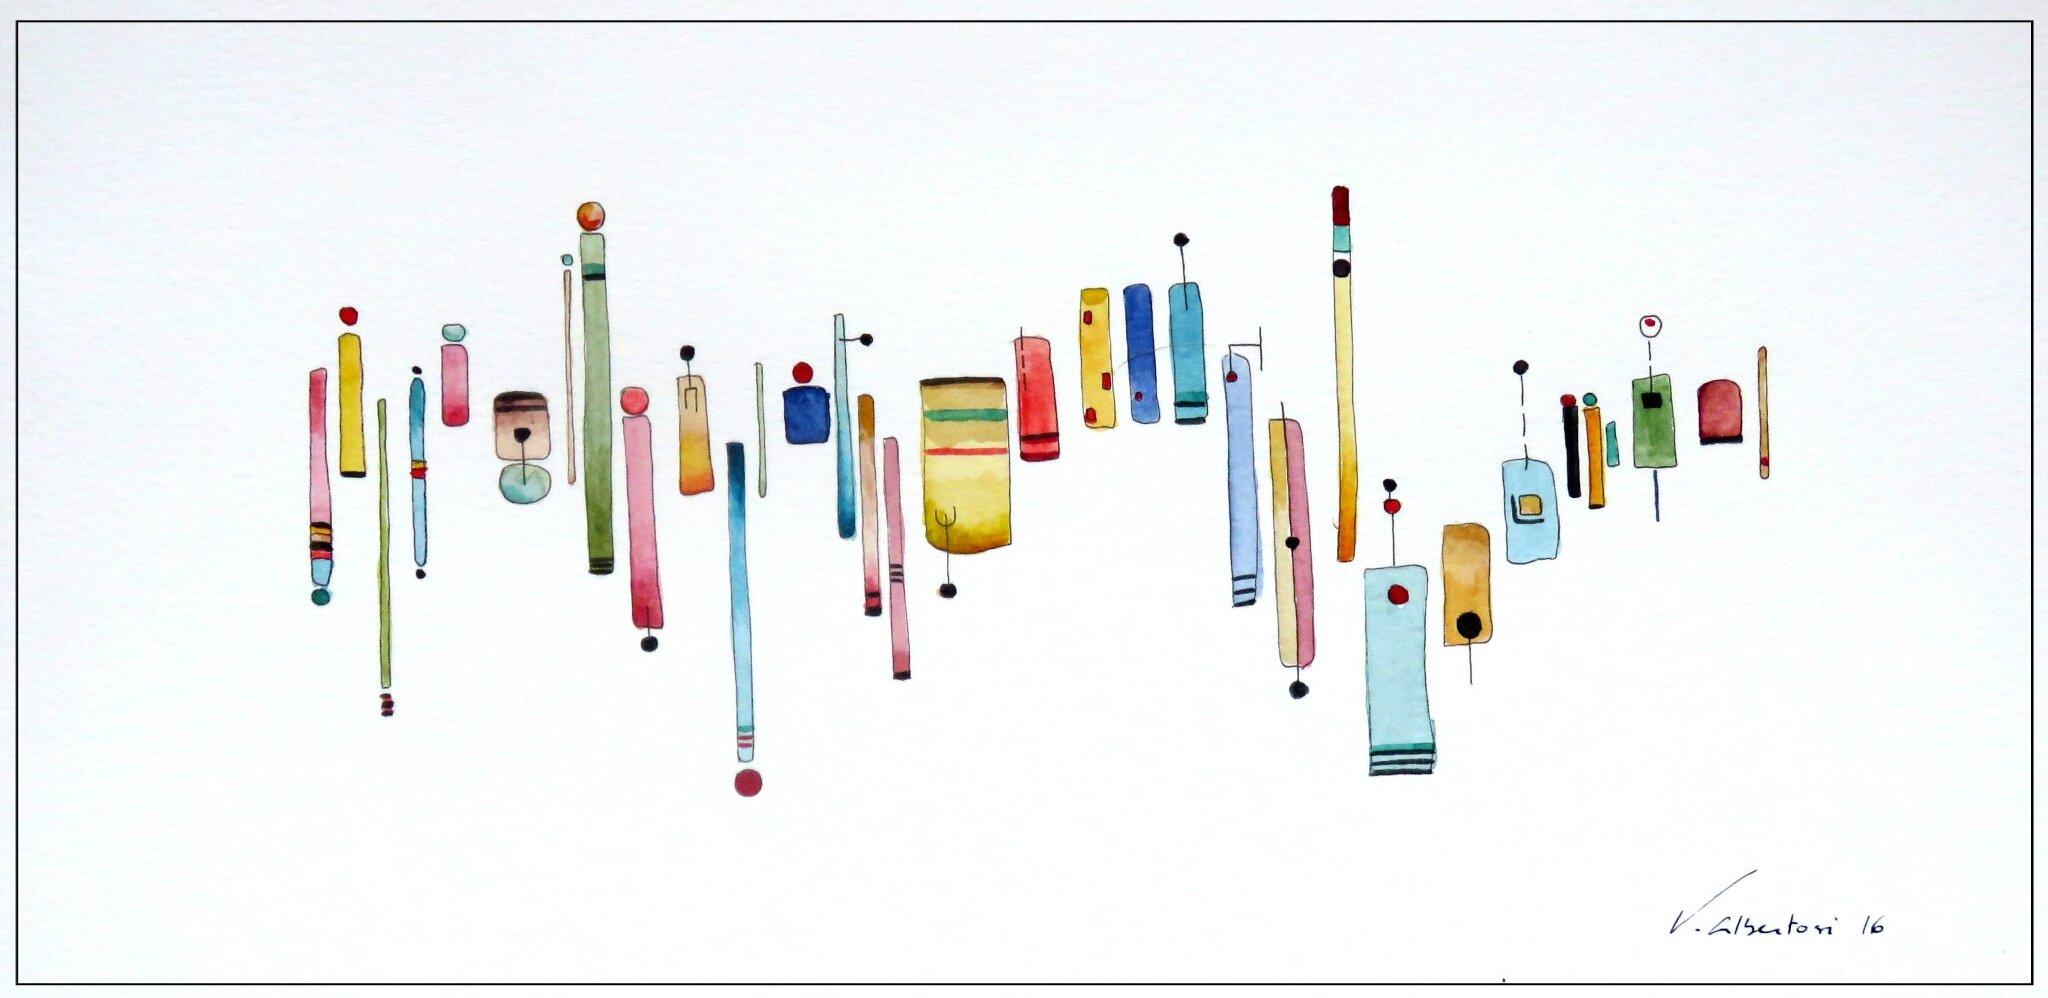 aquarelle abstraite valerie Albertosi artiste peintre française